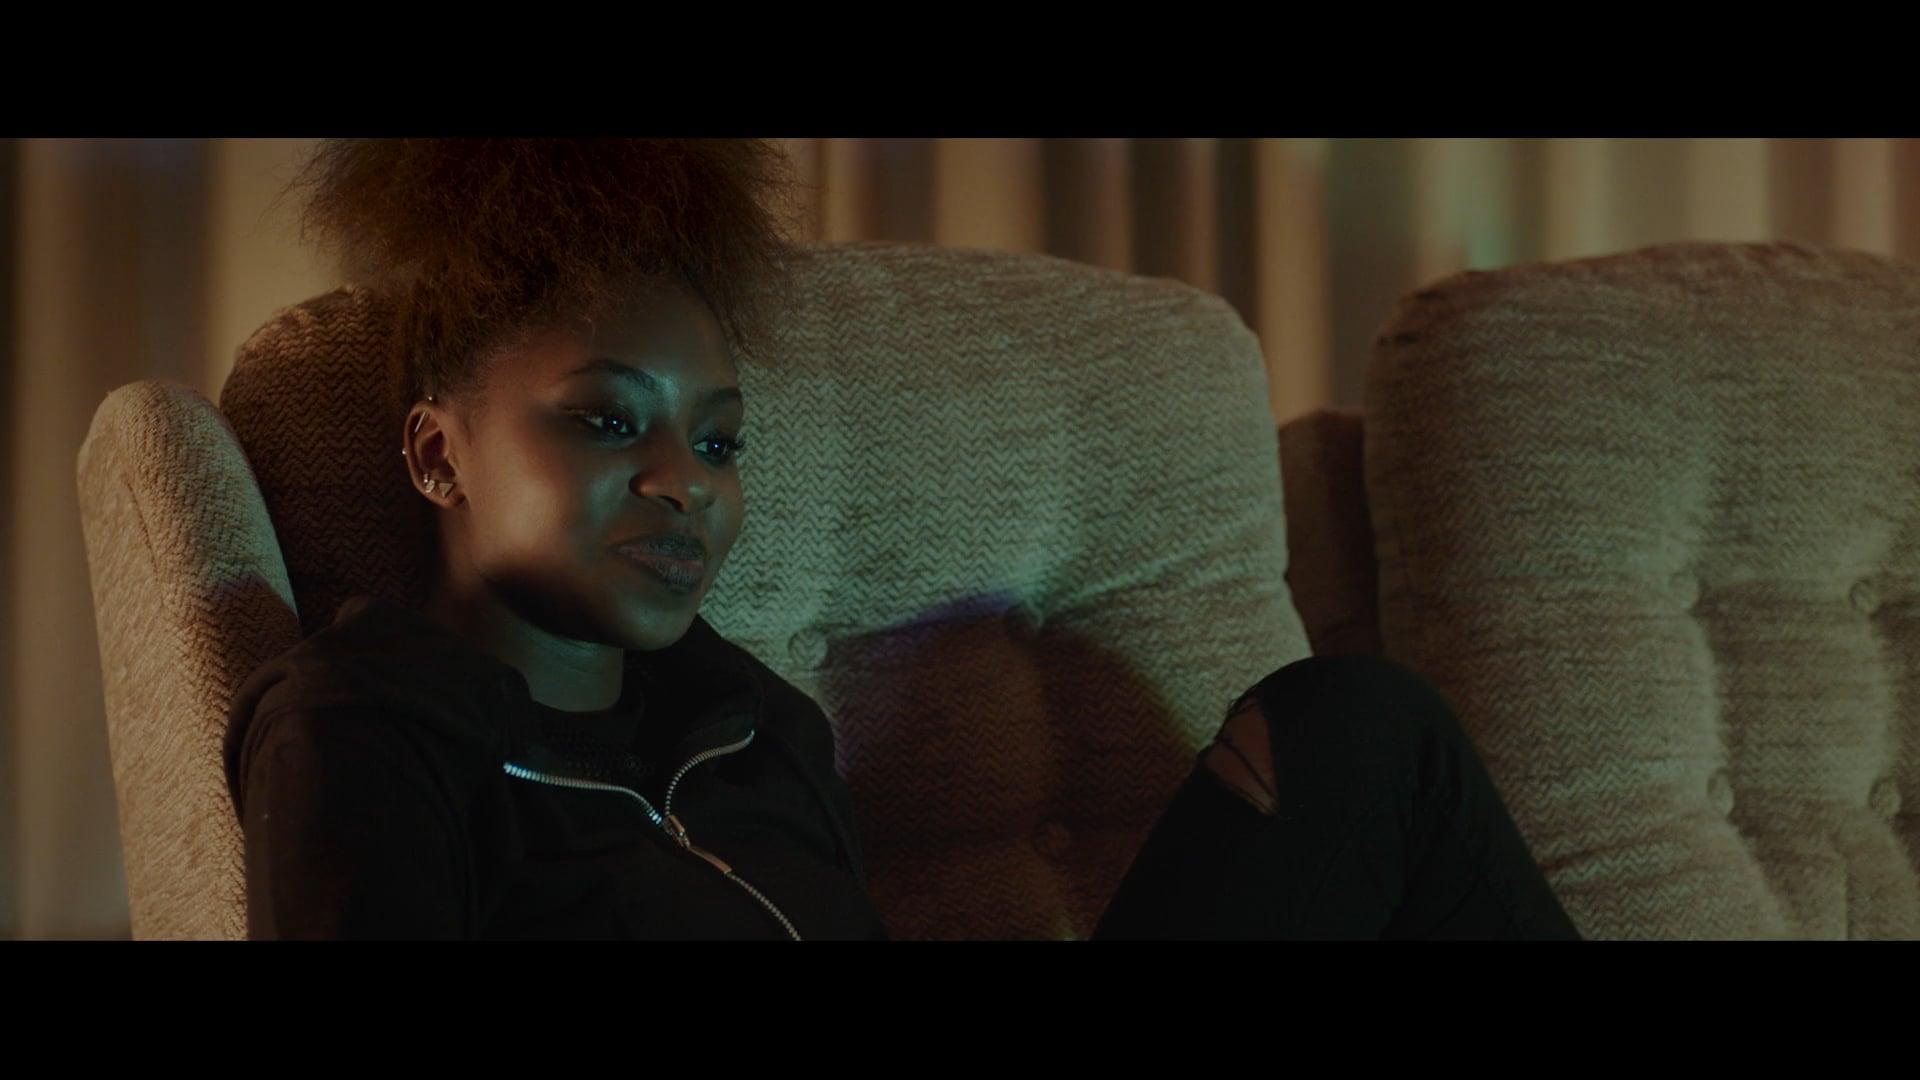 U.K. CINEMAS - Commercial - Discover the Big Screen Experience